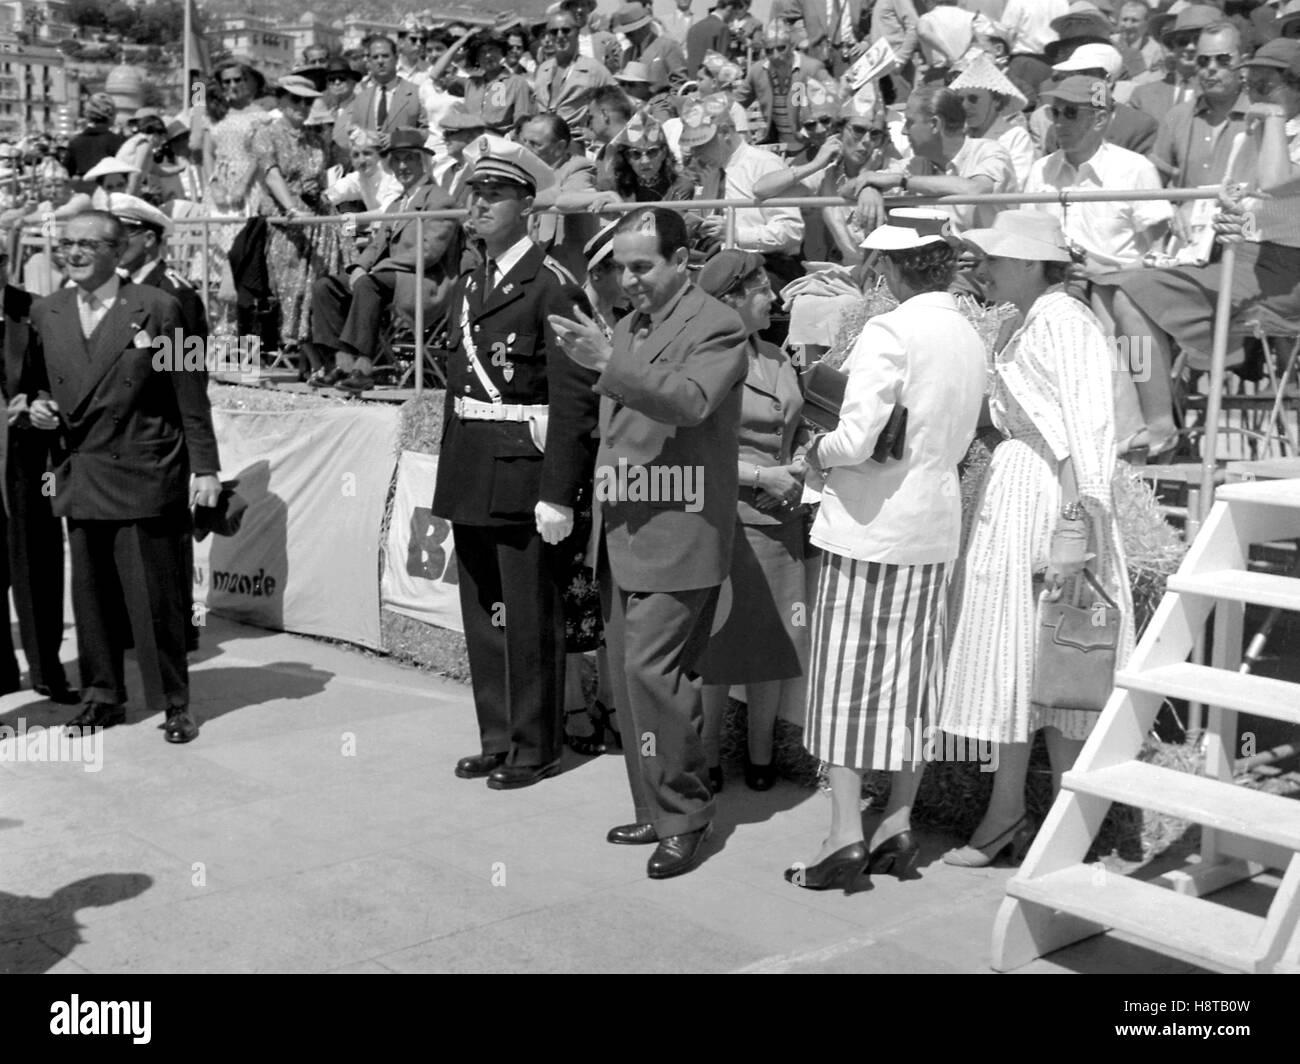 1955 MONACO GP MYSTERY CELEB - Stock Image